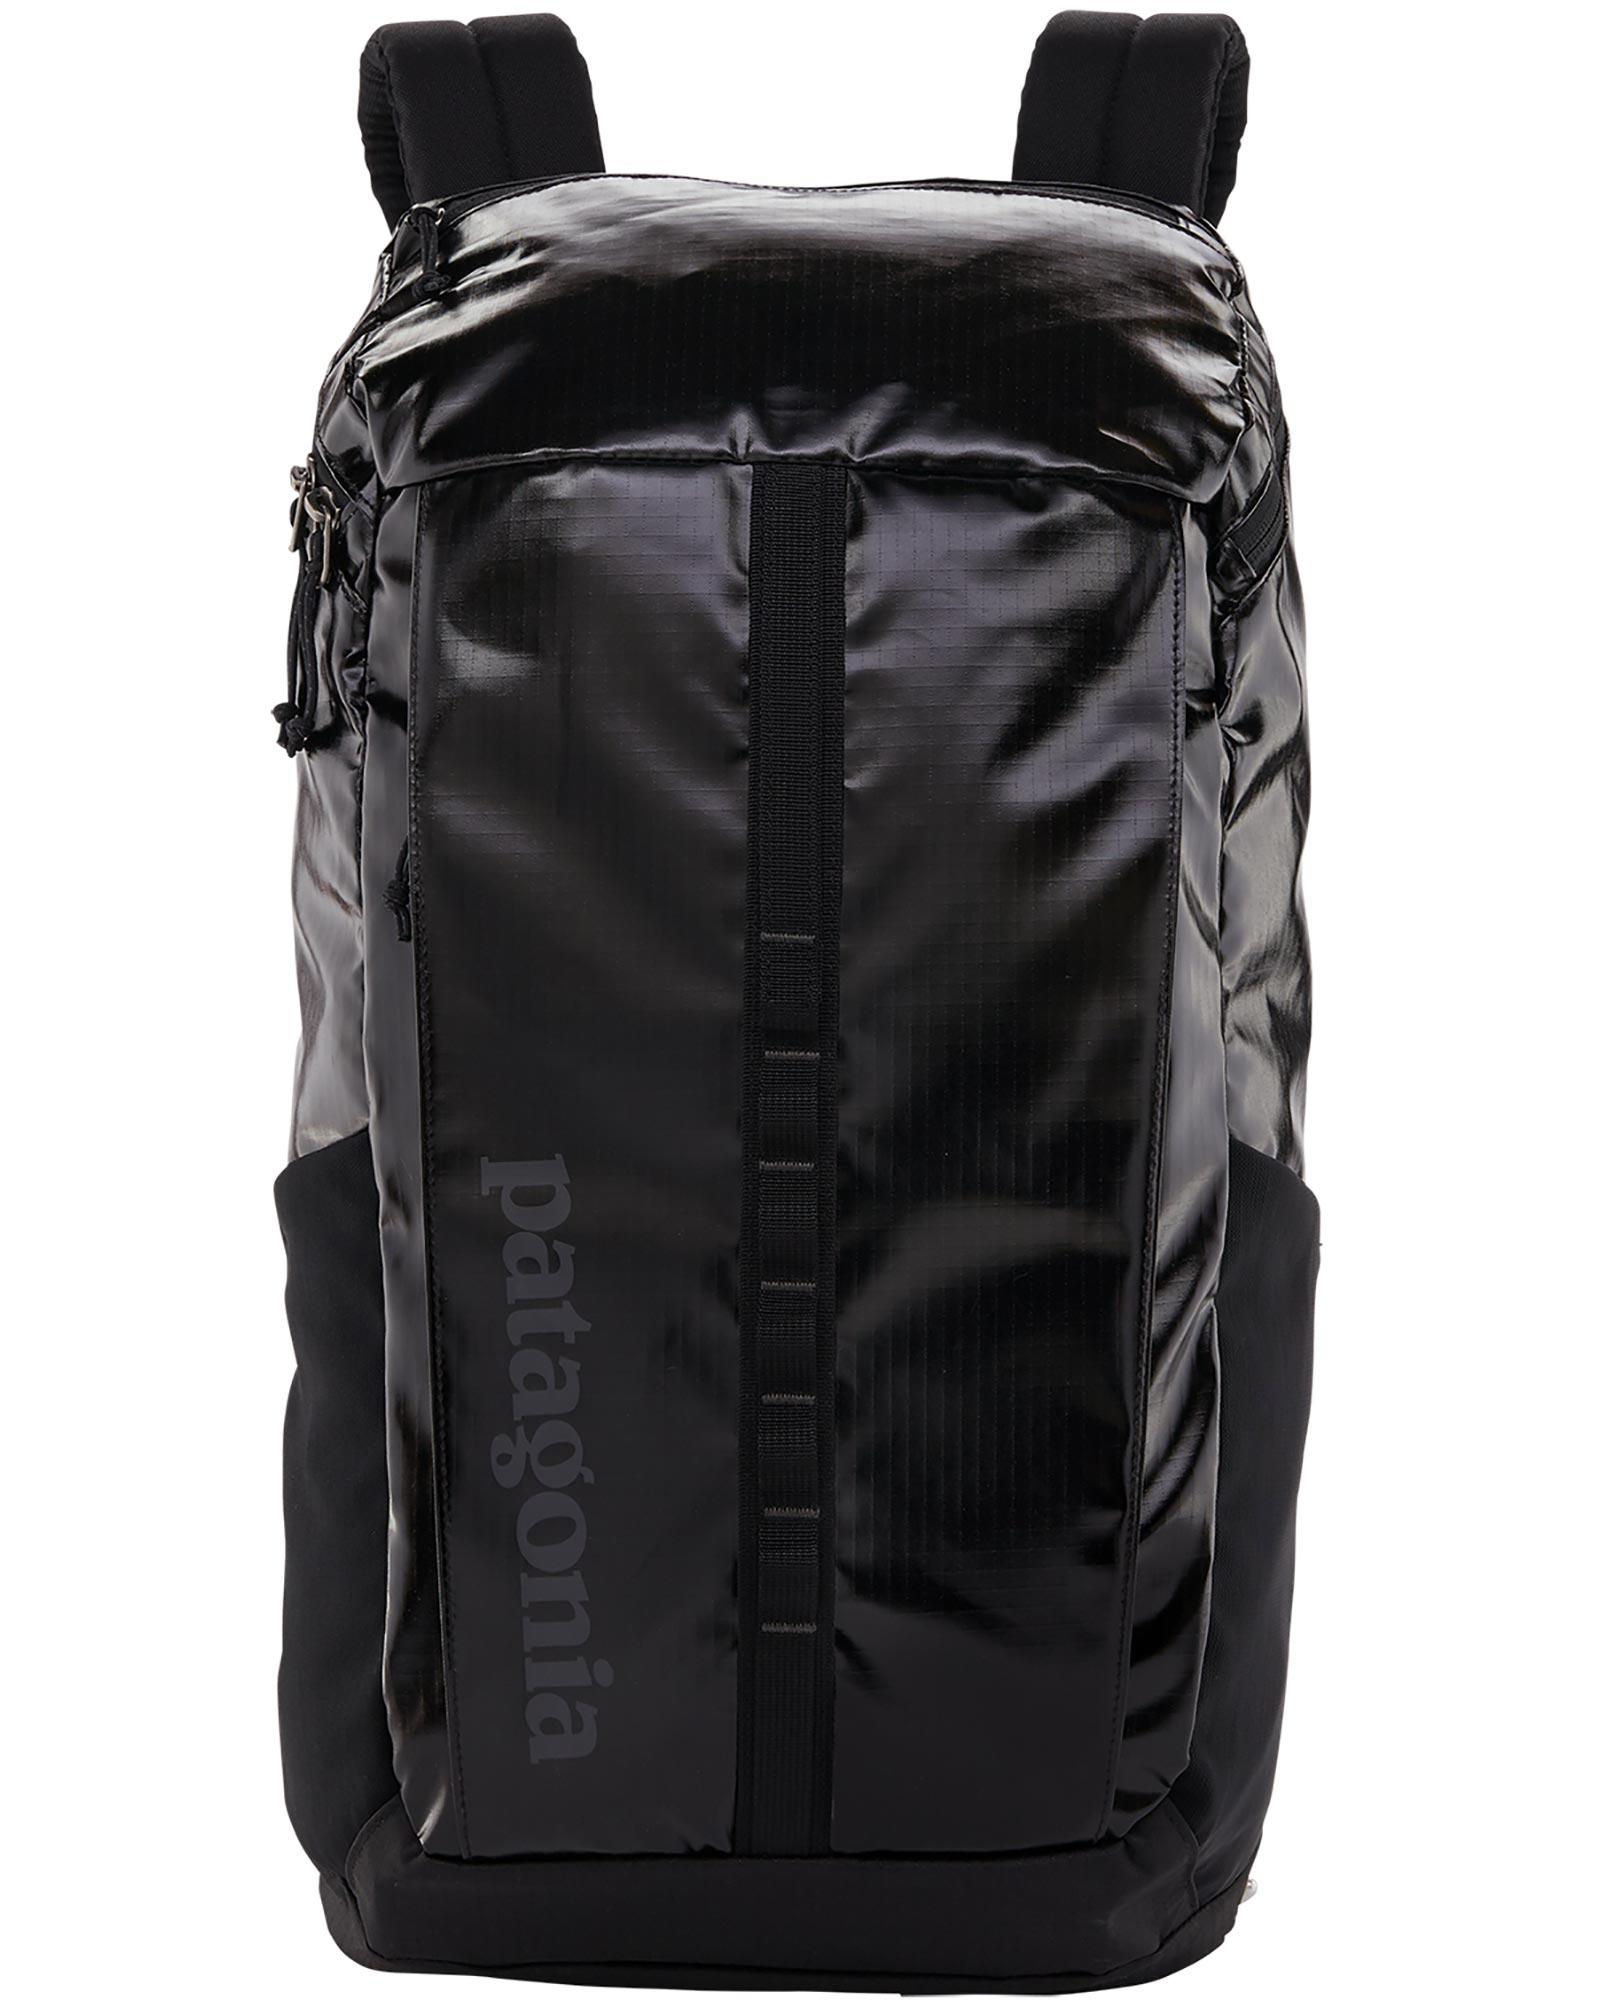 Patagonia Black Hole 25L Backpack 0